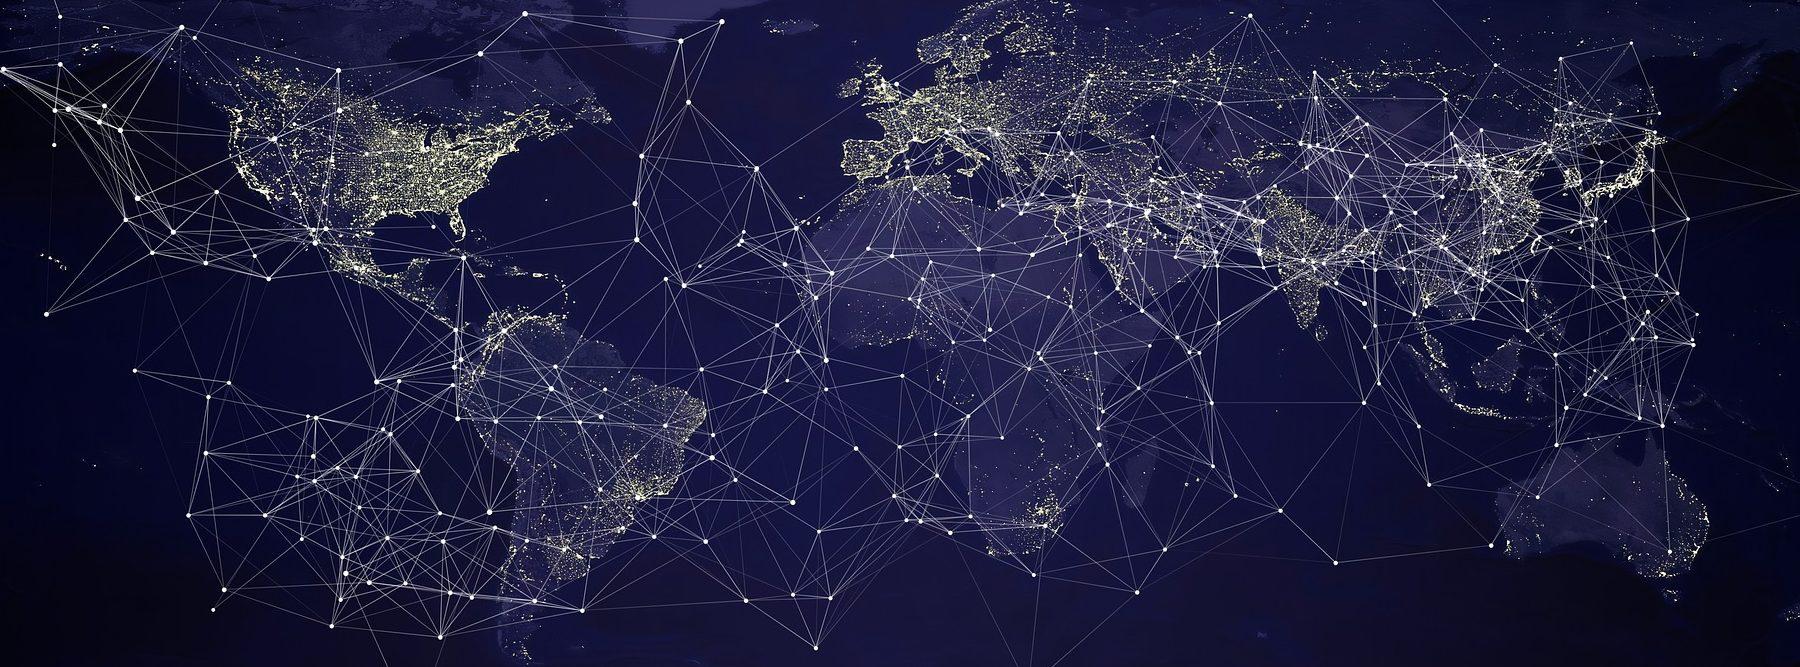 Un mundo hiperconectado, pero… ¿para TODOS?